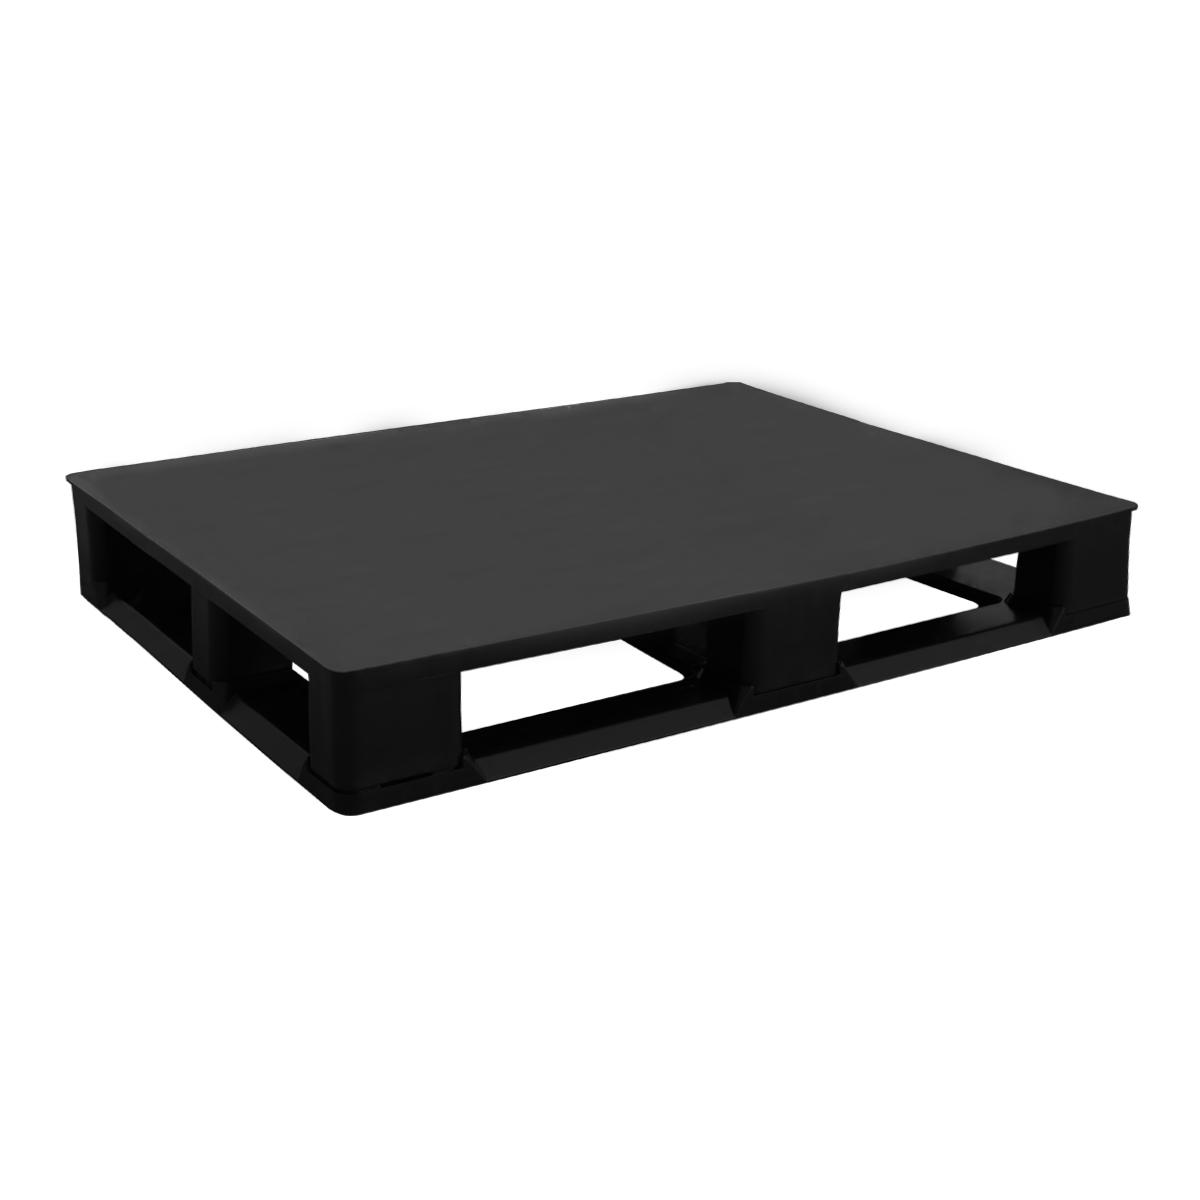 h tipi plastik palet 100x120cm siyah kızaklı kapalı